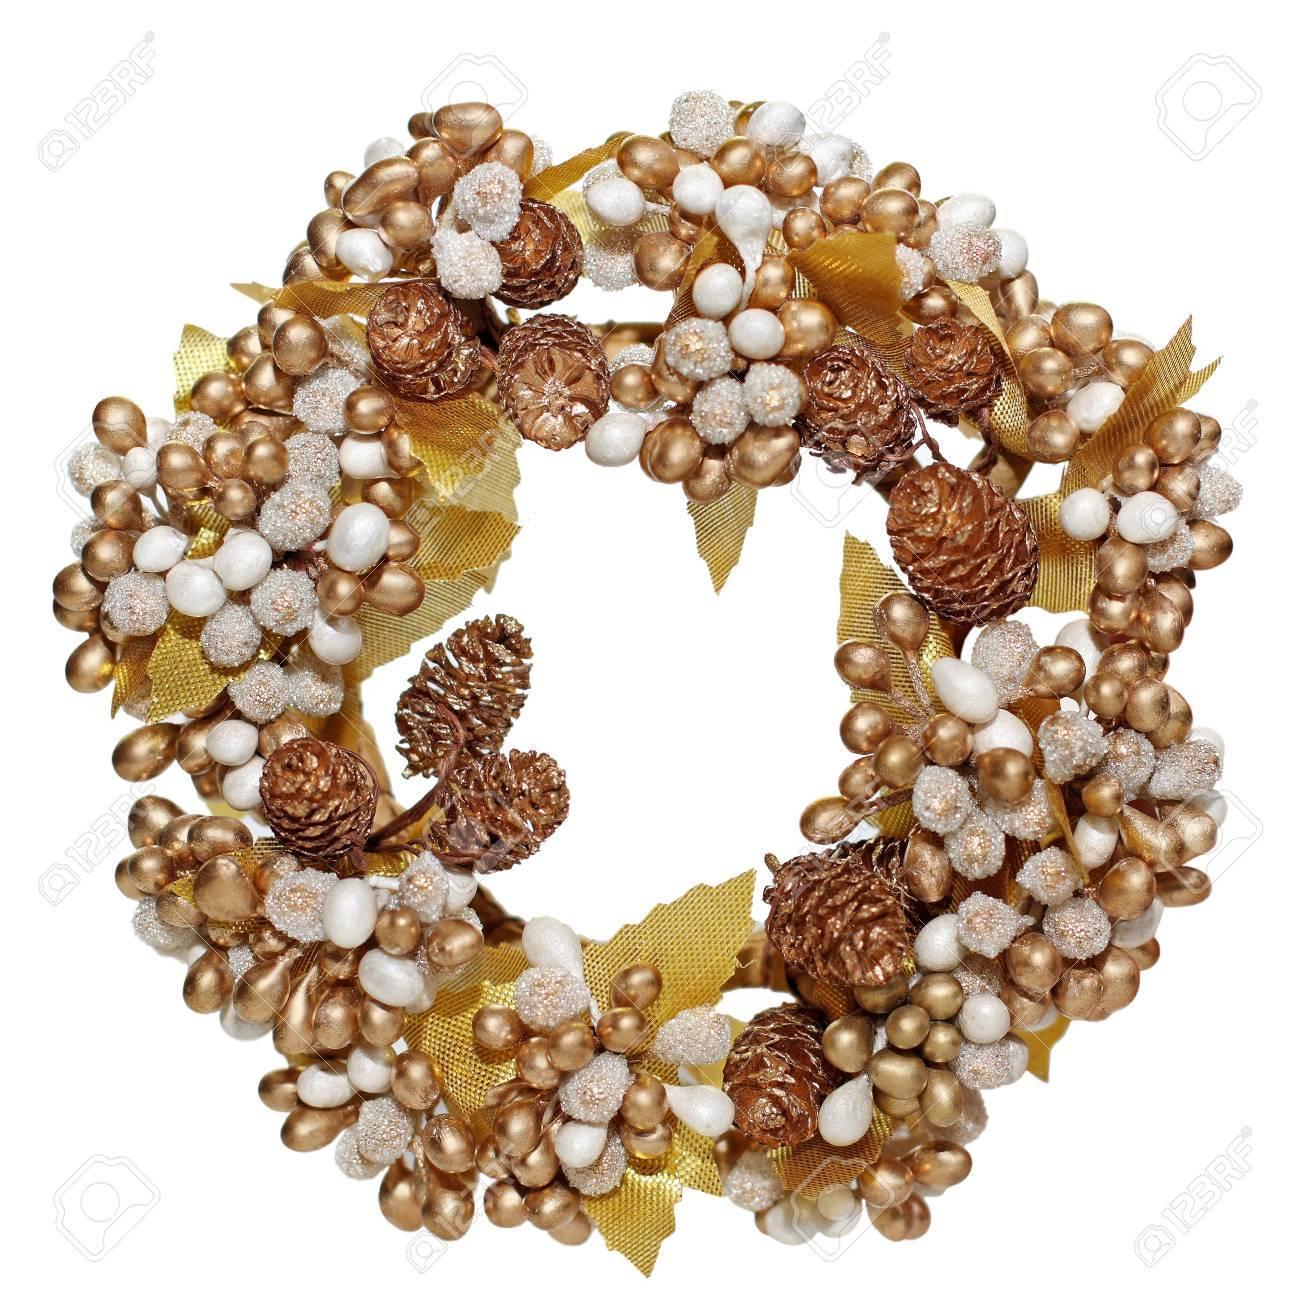 Christmas wreath isolated on white background Stock Photo - 8352565